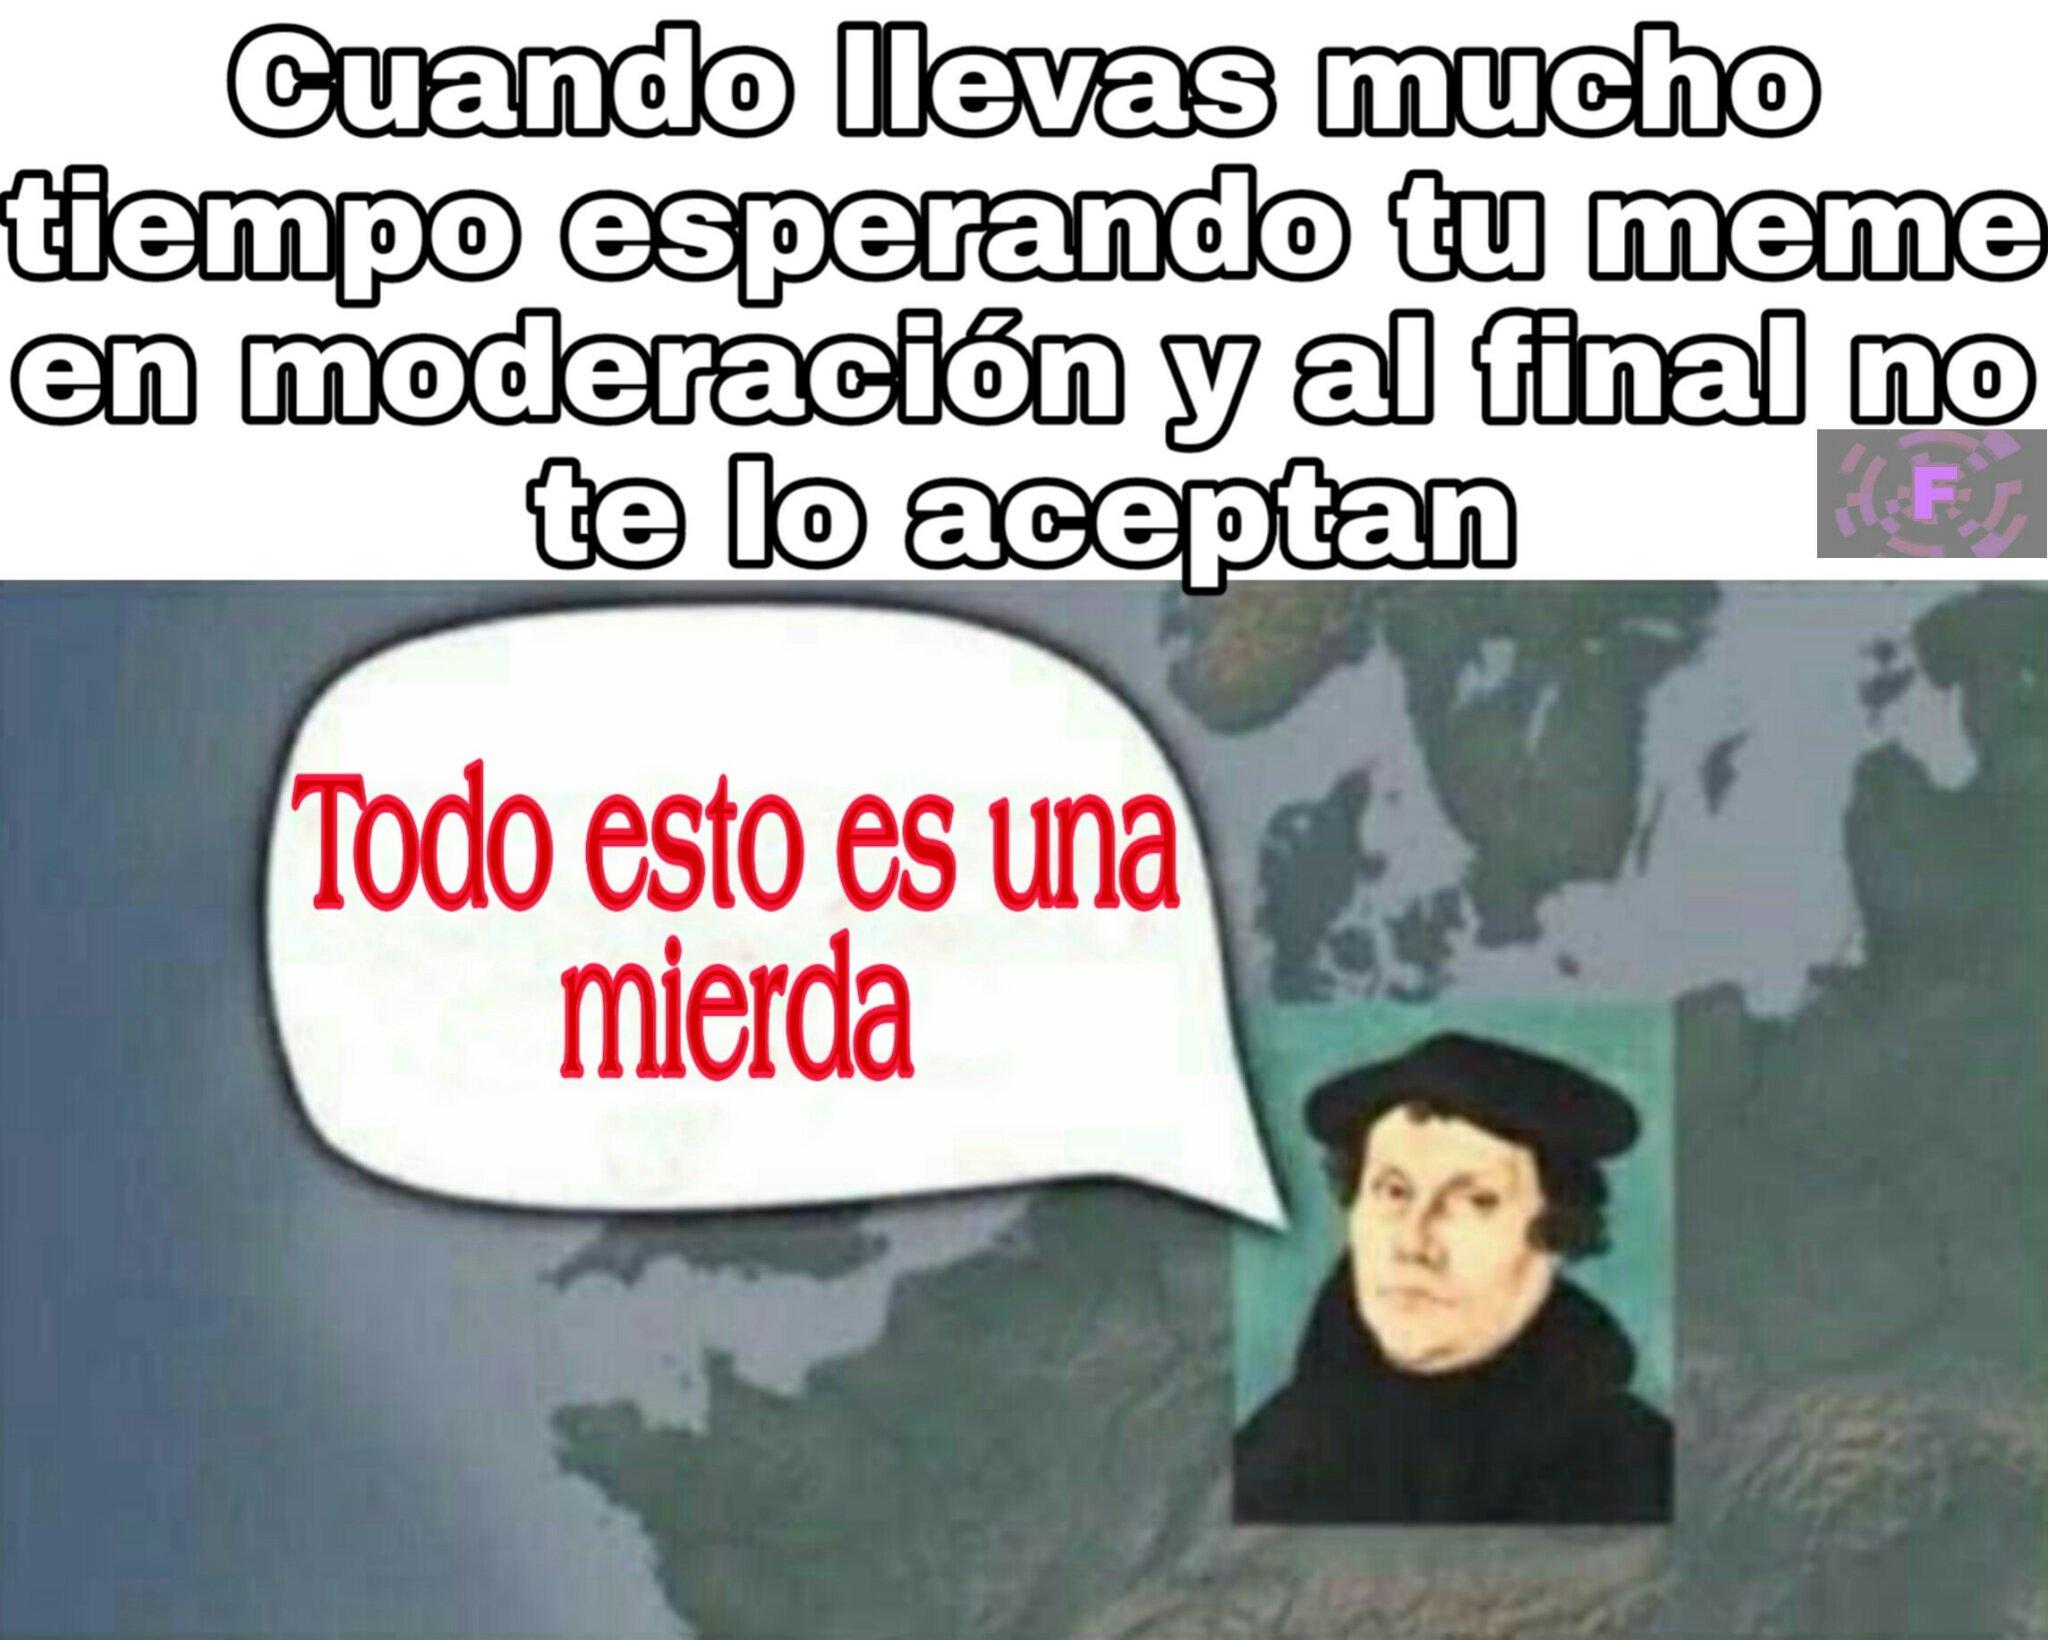 Plantilla Gratis, Amigos!!!! :D - meme